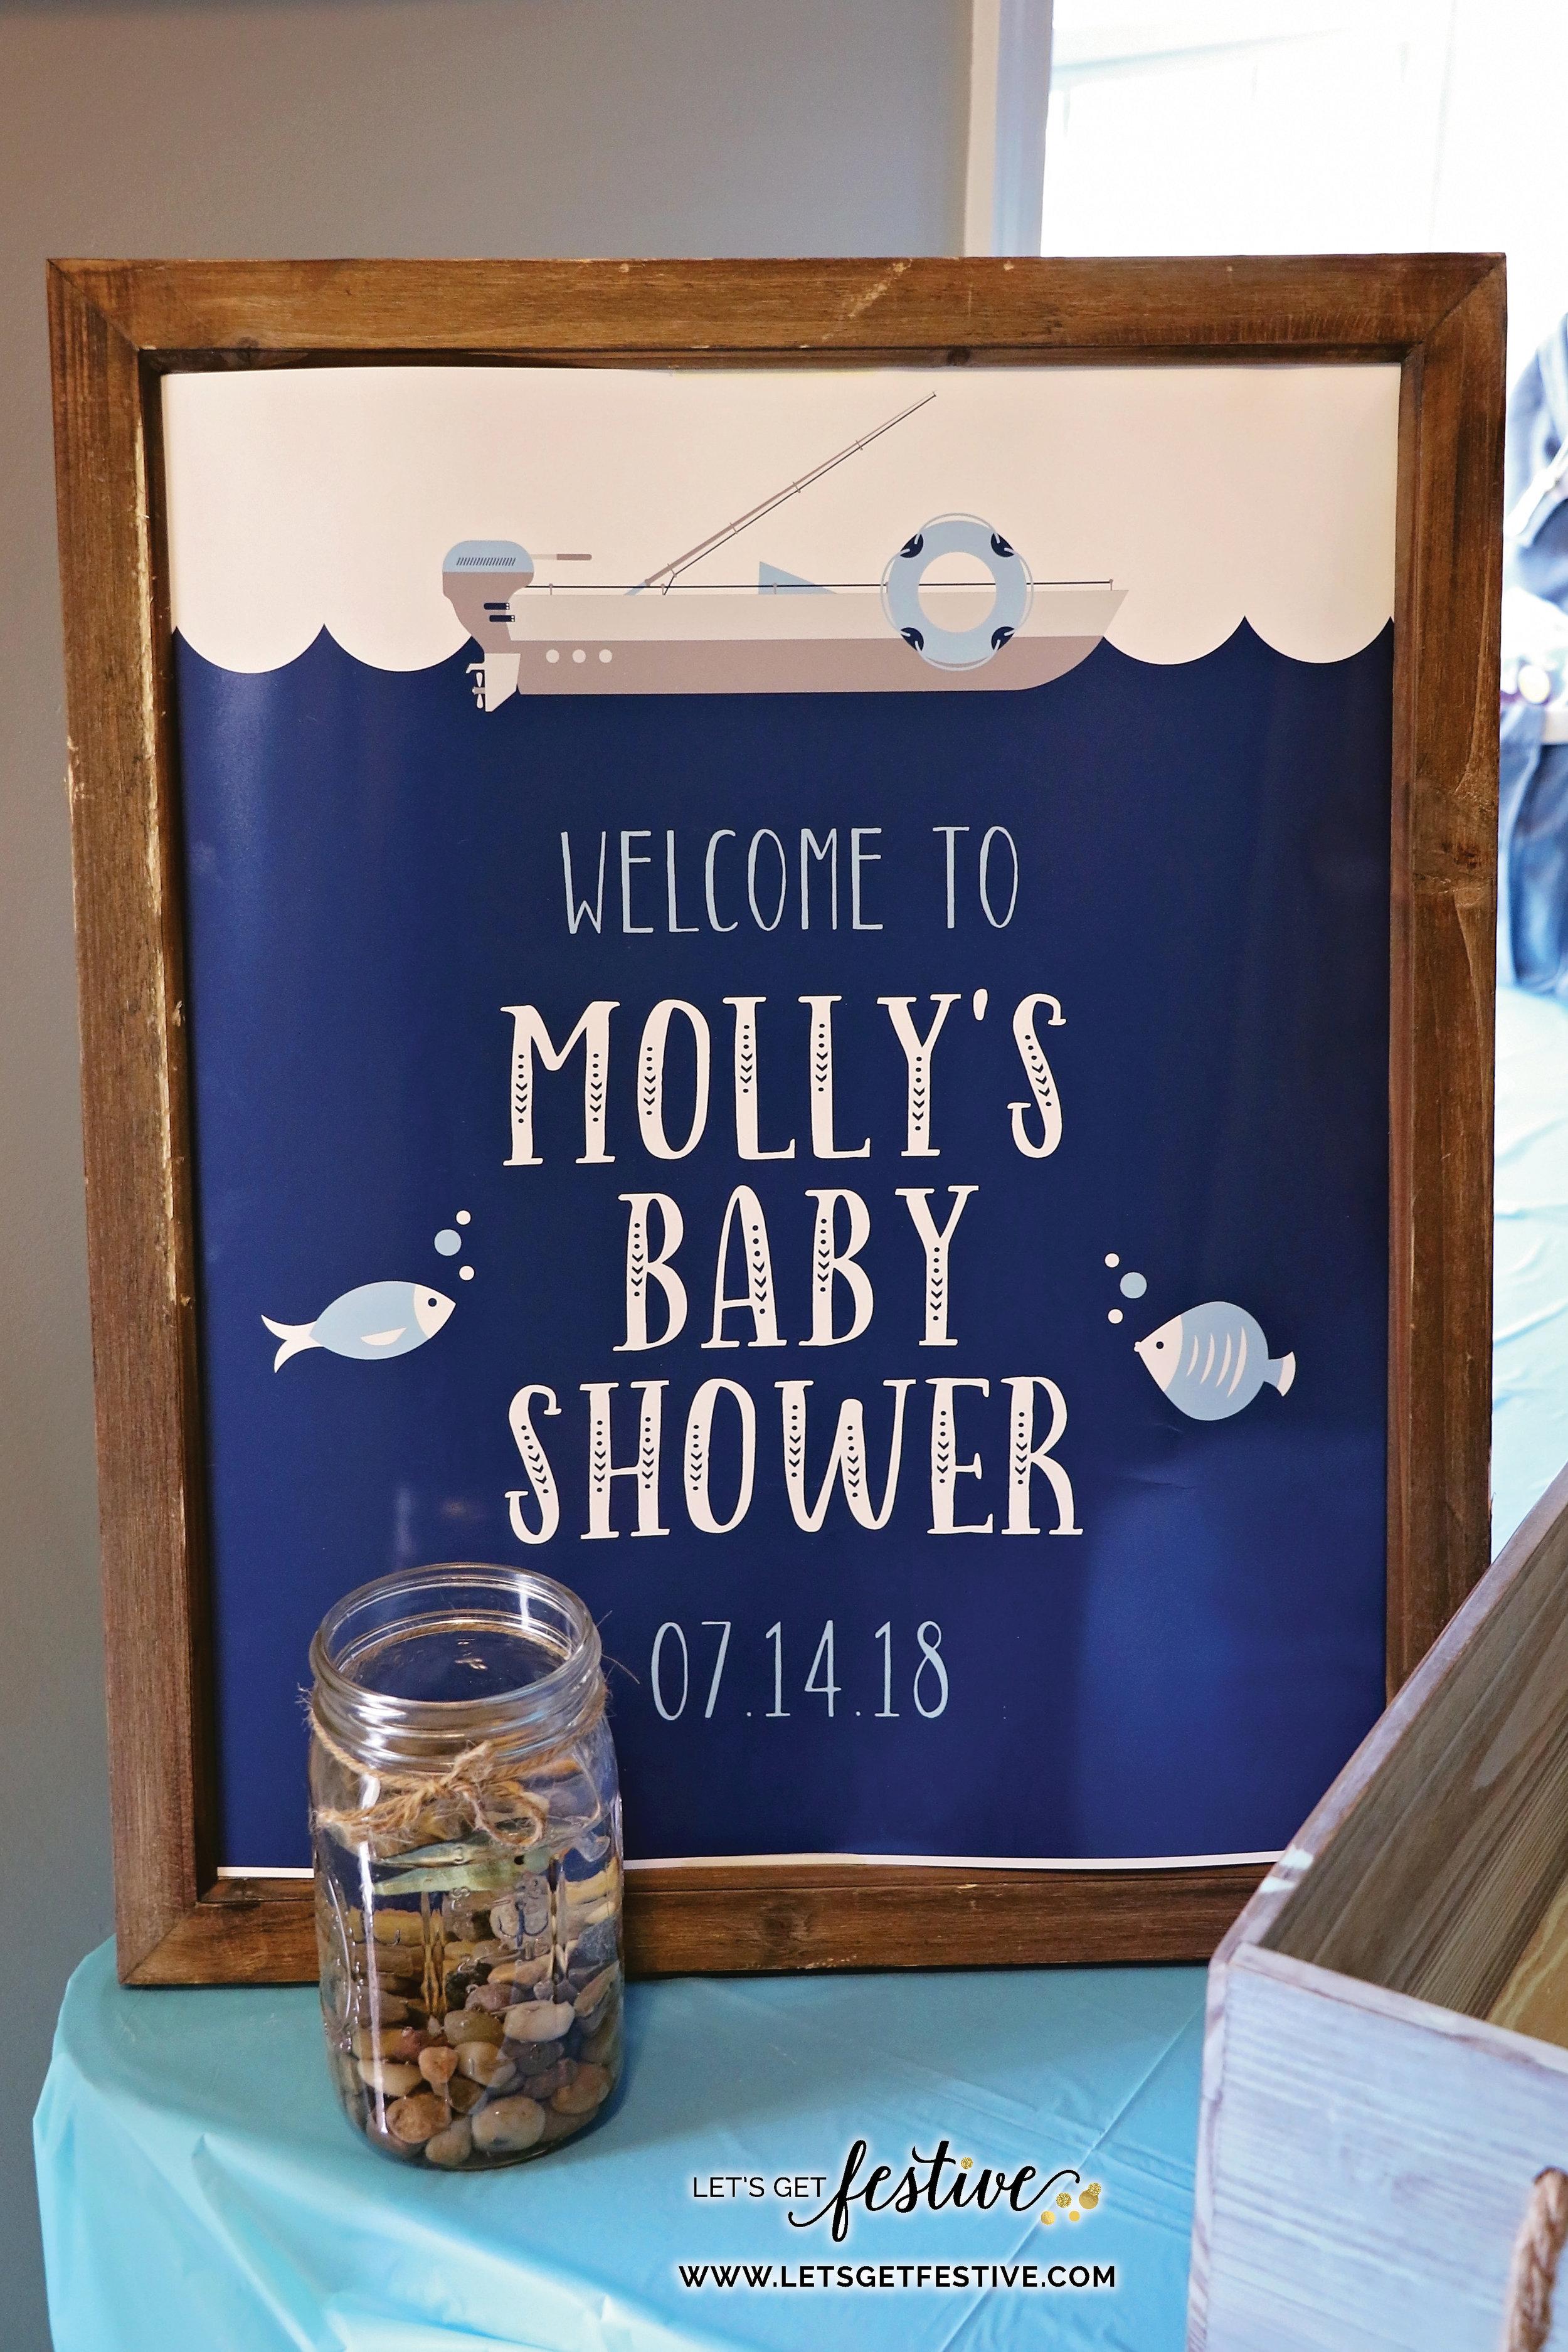 LetsGetFestive_Baby Shower 7.jpg